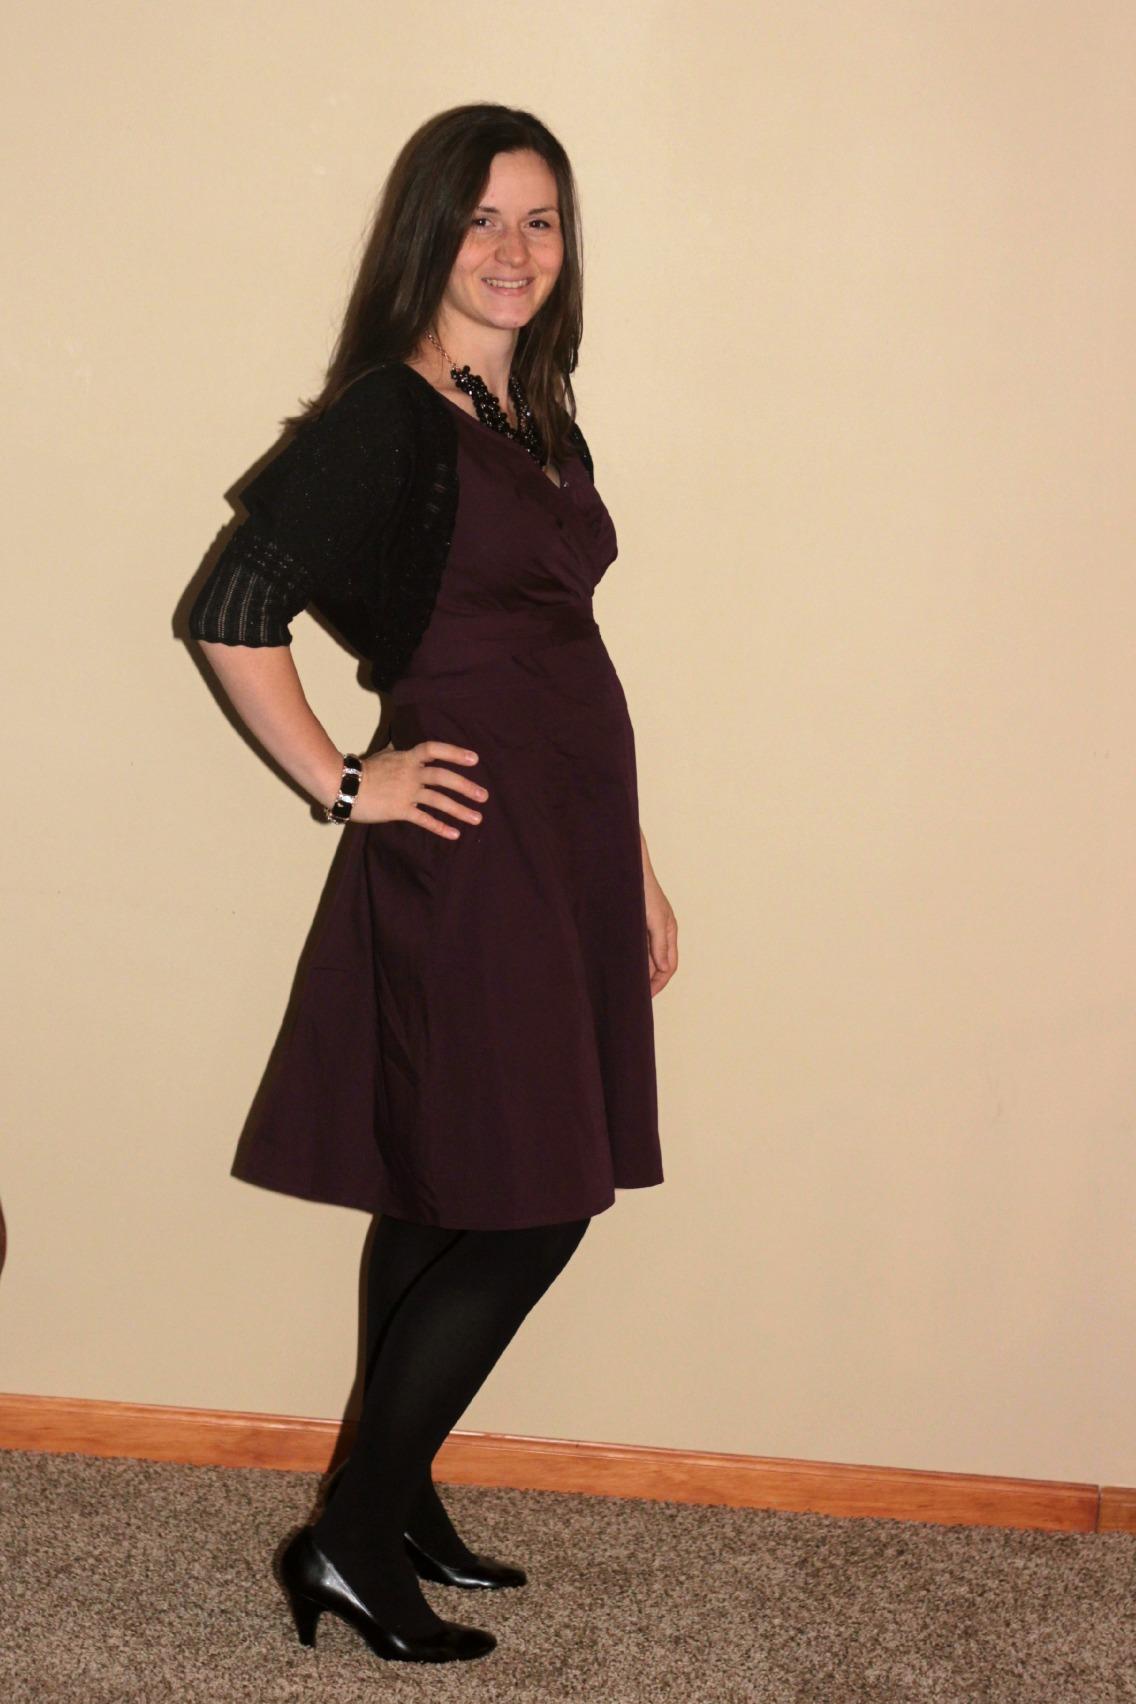 89388f9c18b eShakti Ellen Dress Review - Efficient Momma